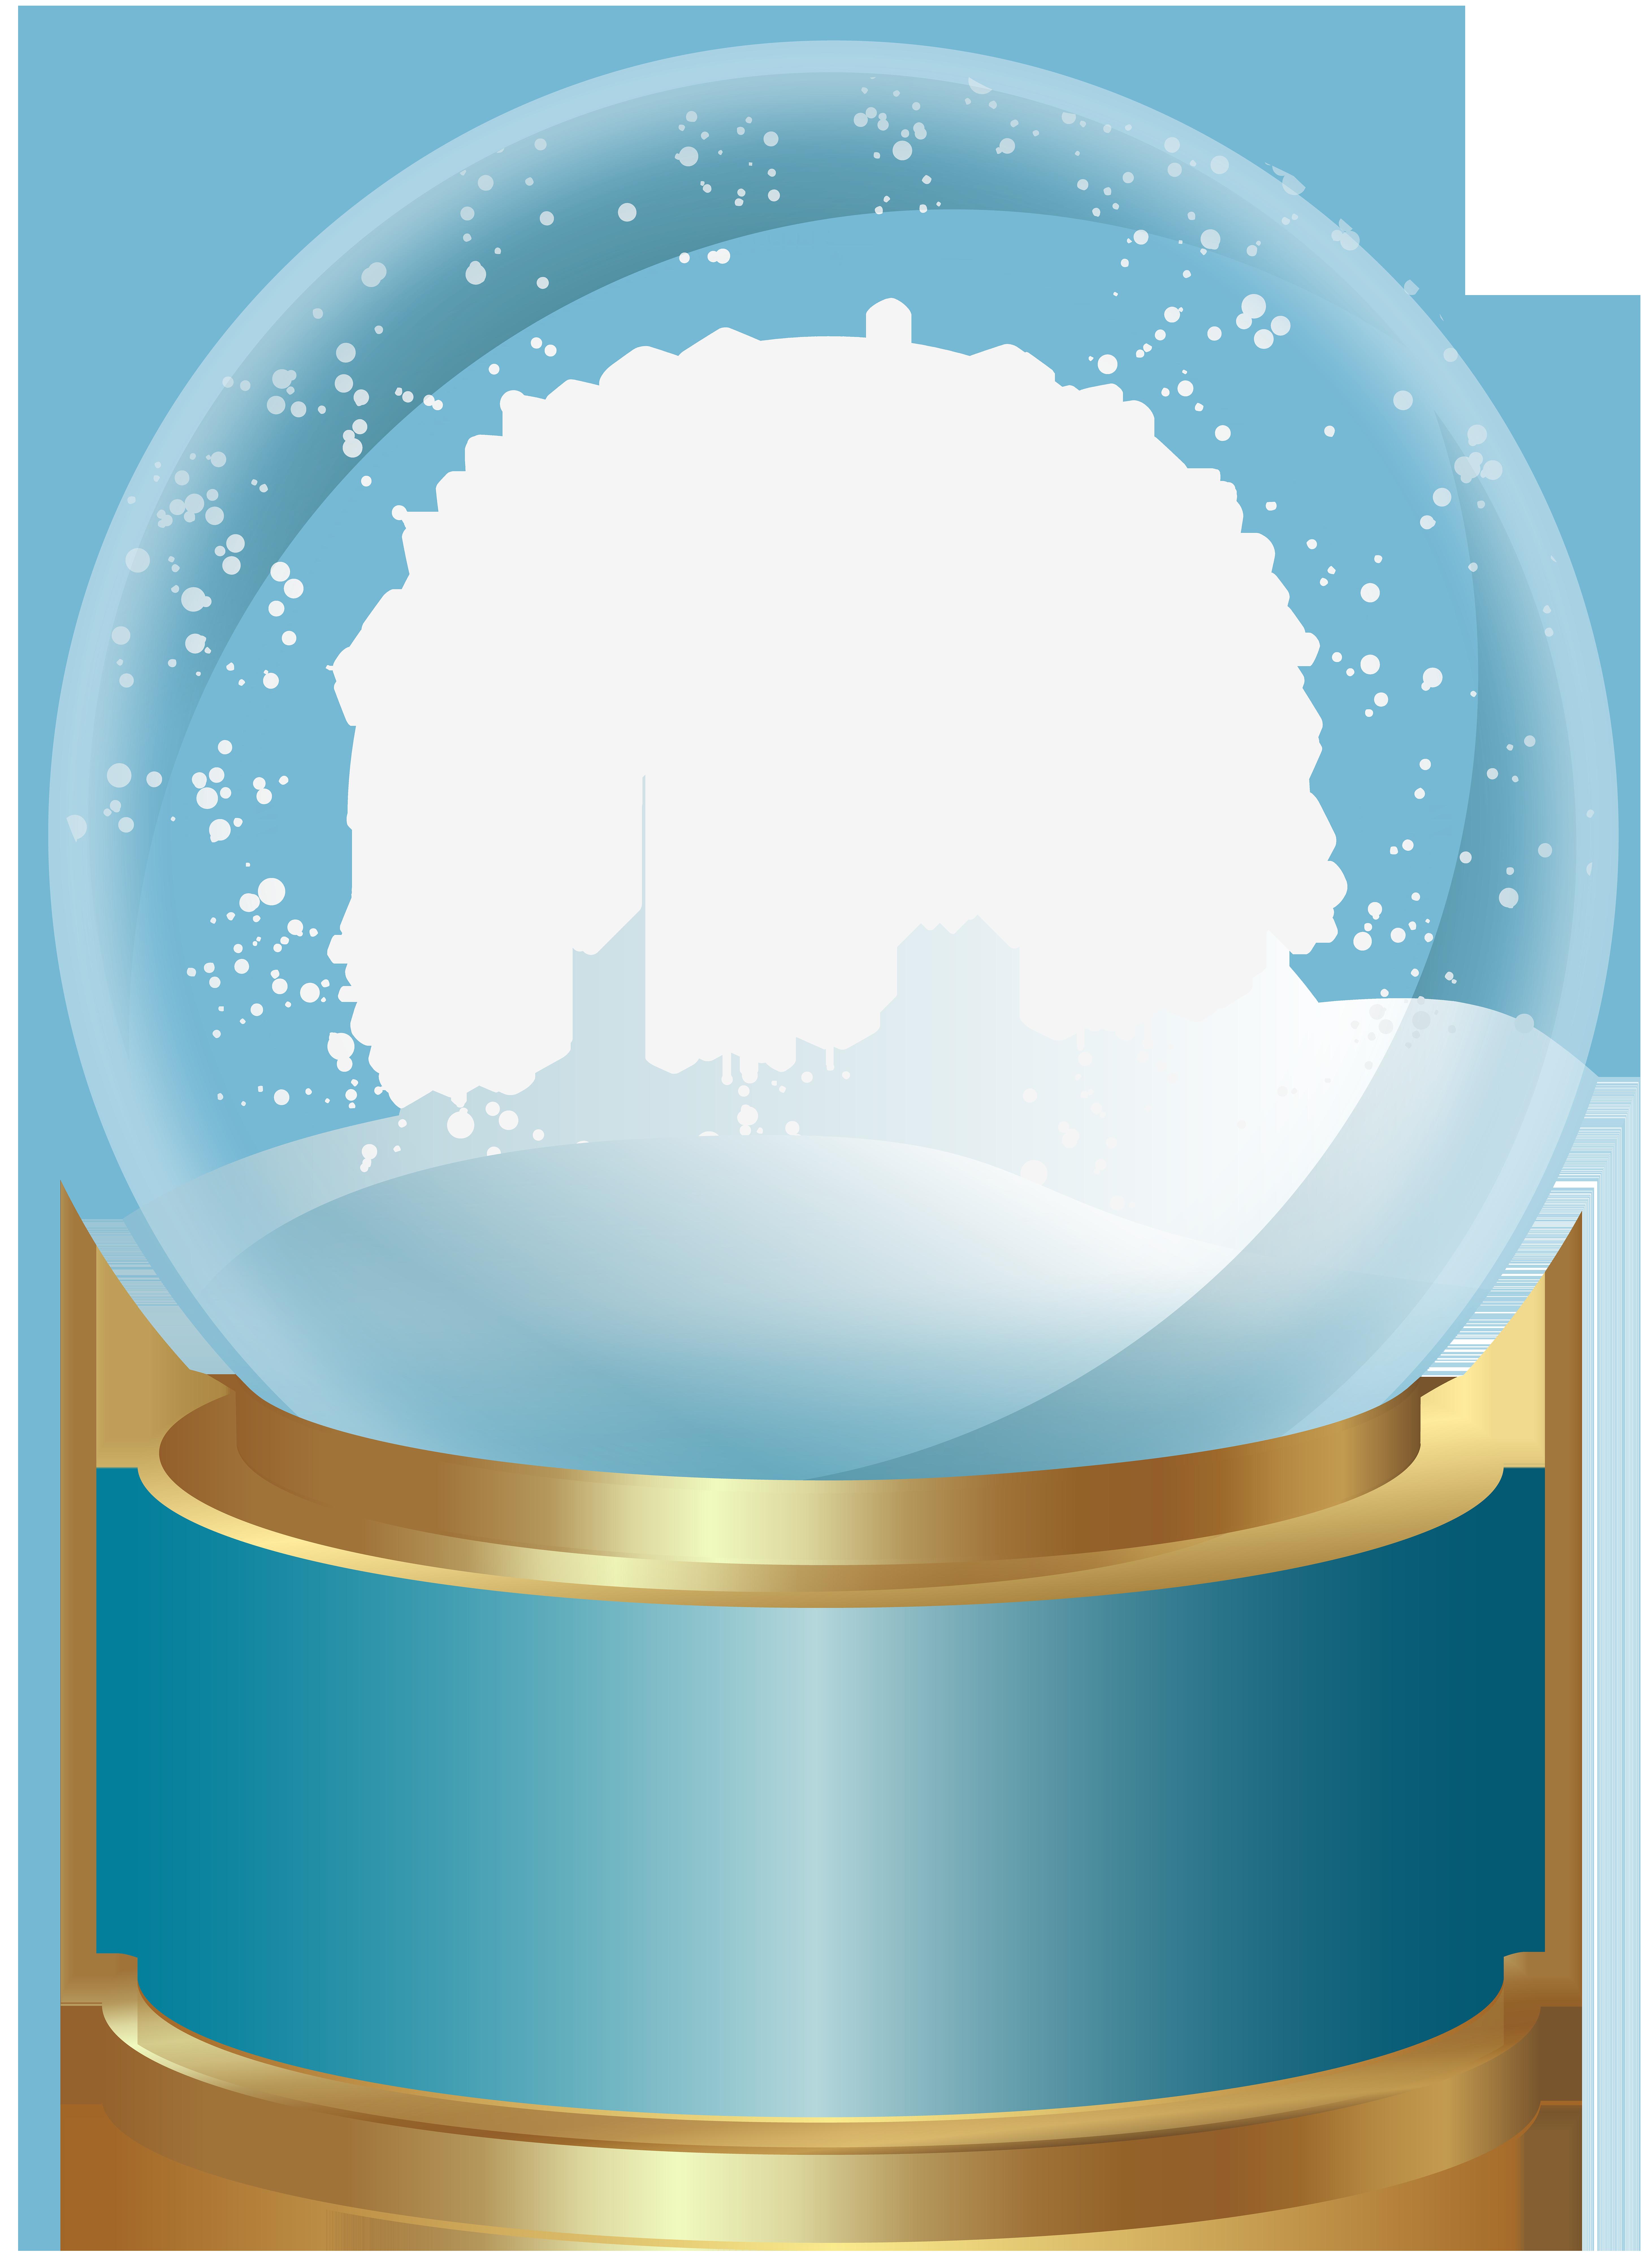 Blue snowglobe clipart